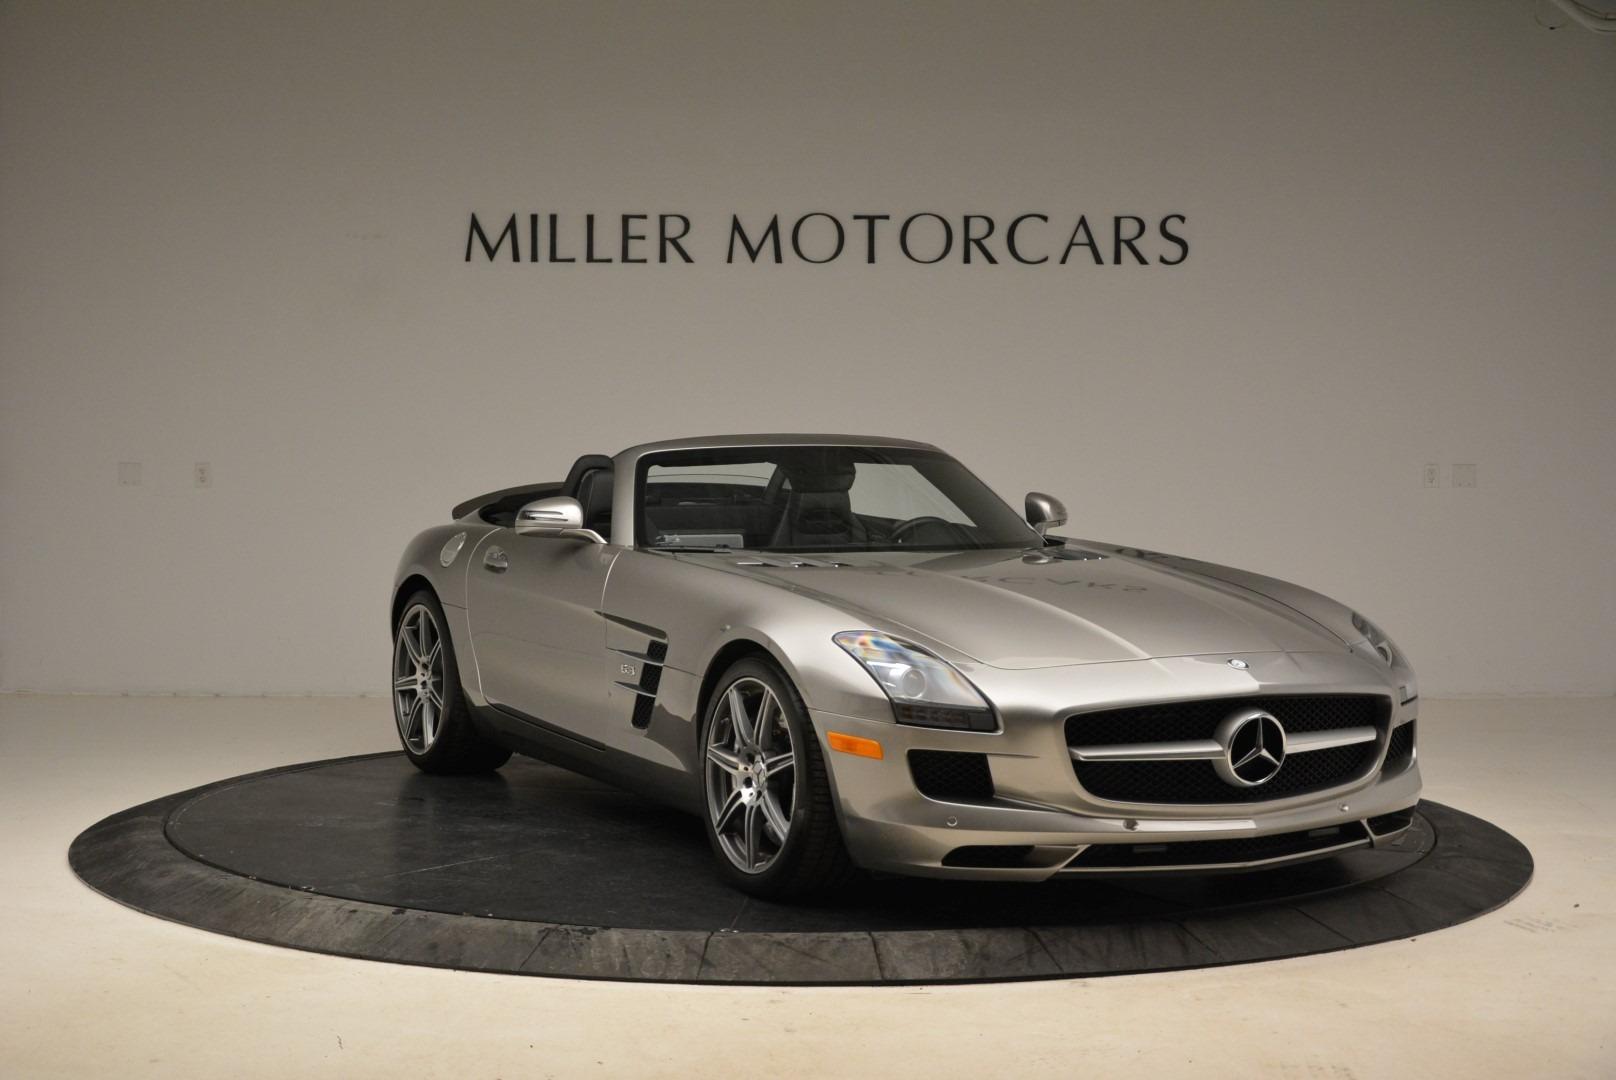 Used 2012 Mercedes-Benz SLS AMG  For Sale In Westport, CT 2068_p11